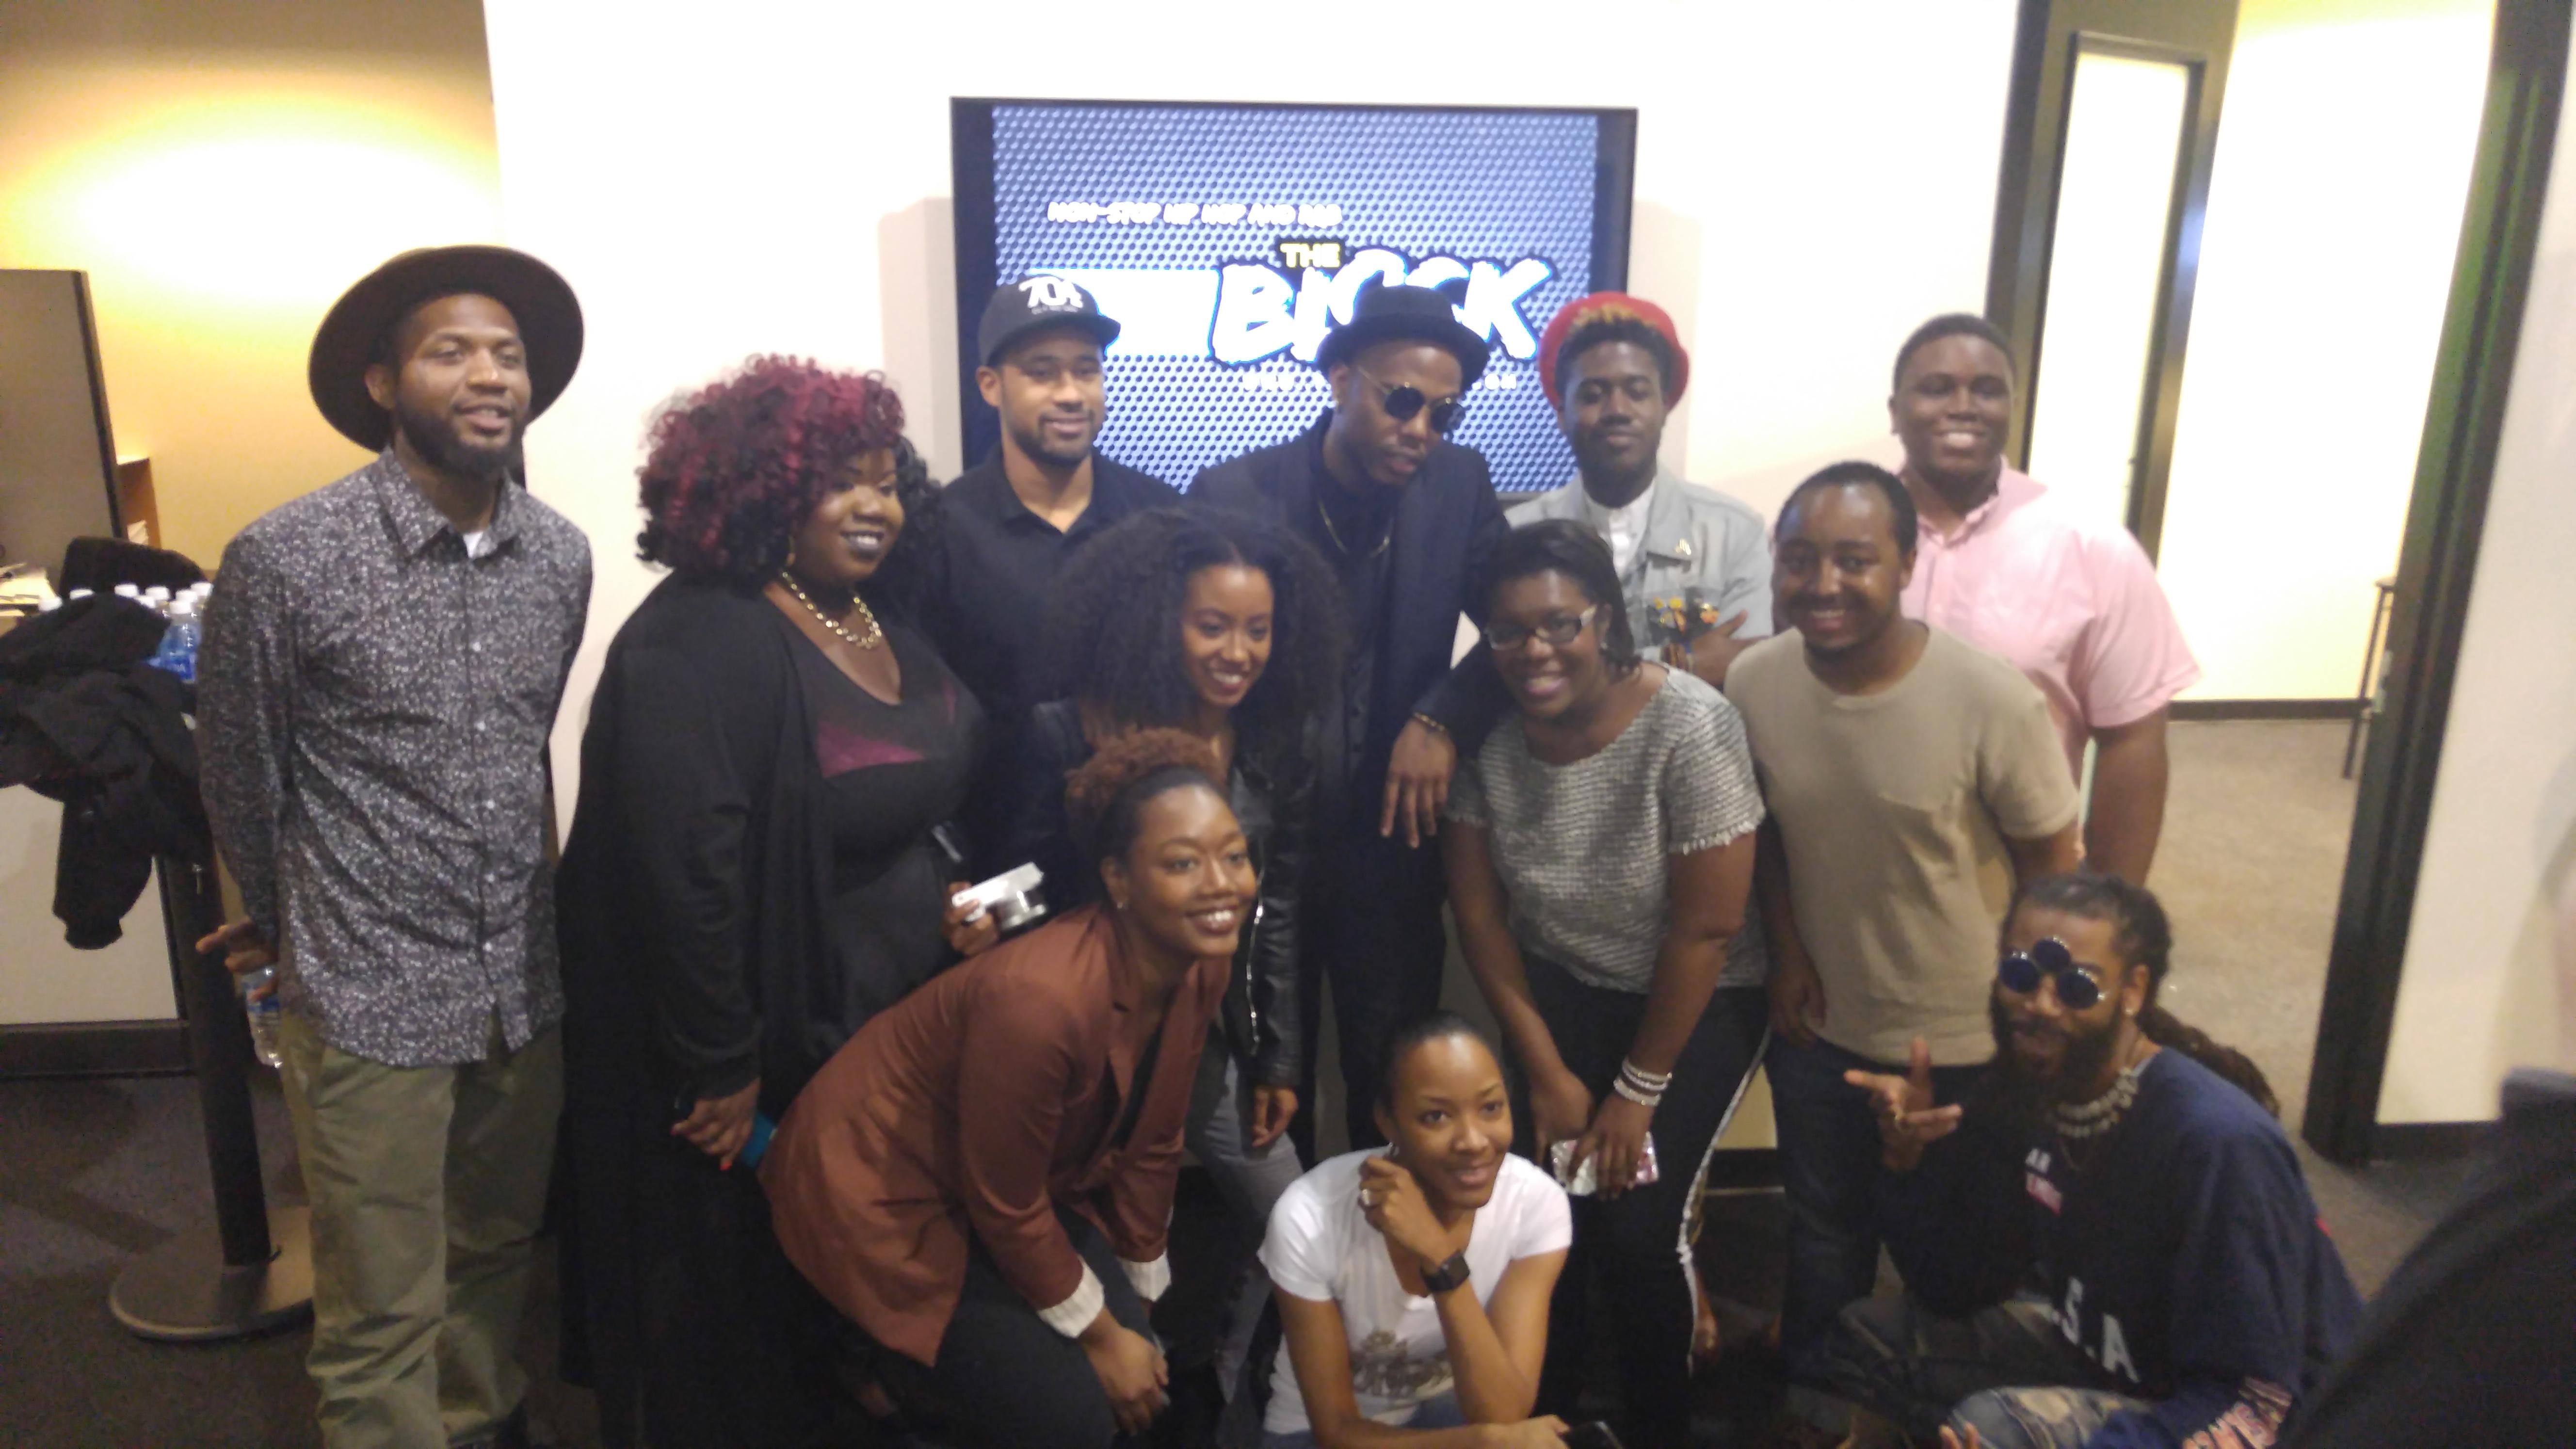 Bloggin' On The Block with B.O.B